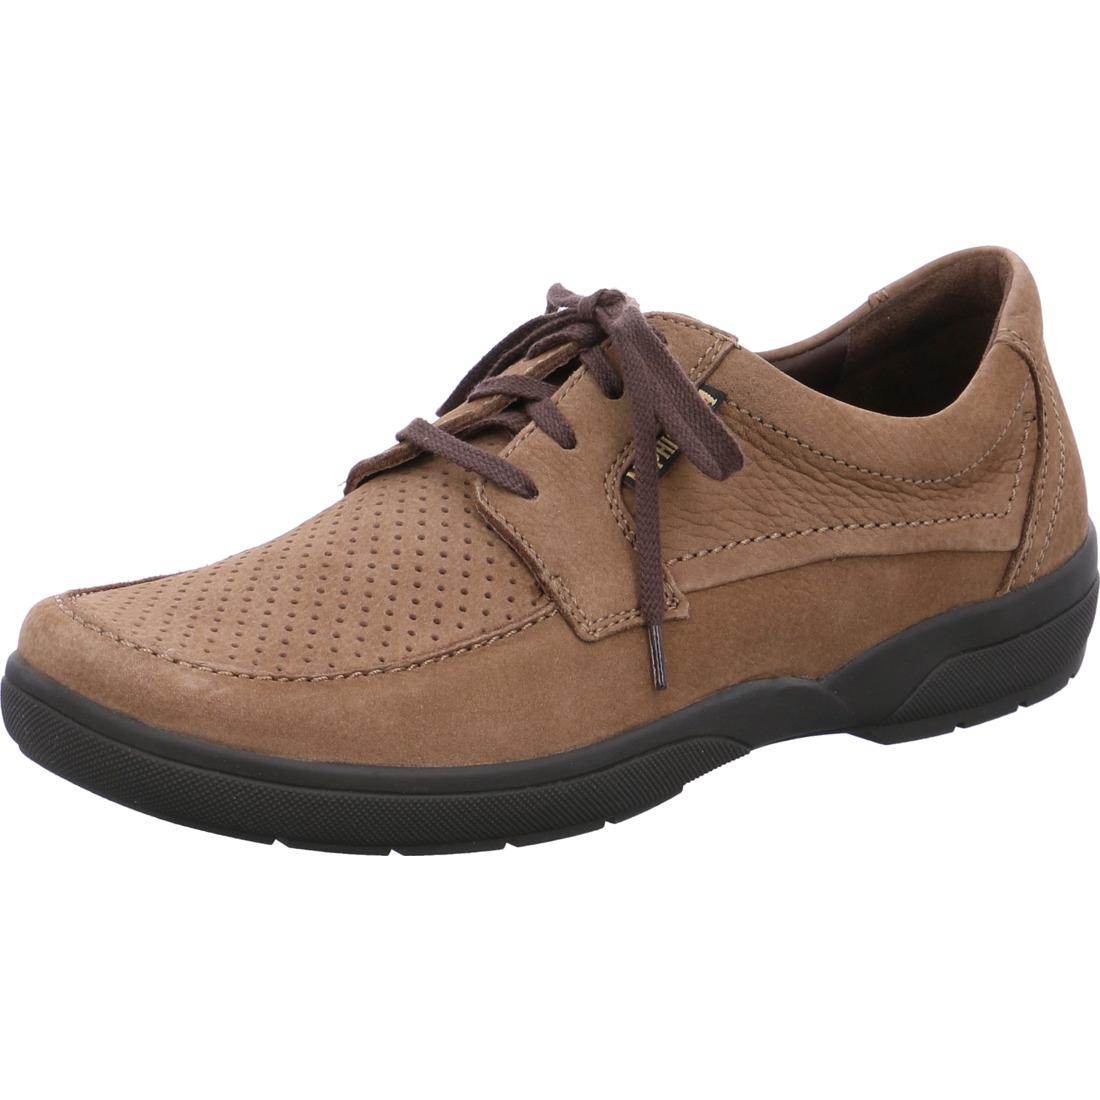 Mephisto chaussures AGAZIO   Chaussures à laçage   Homme   Mephisto Store 96f5ec73049e